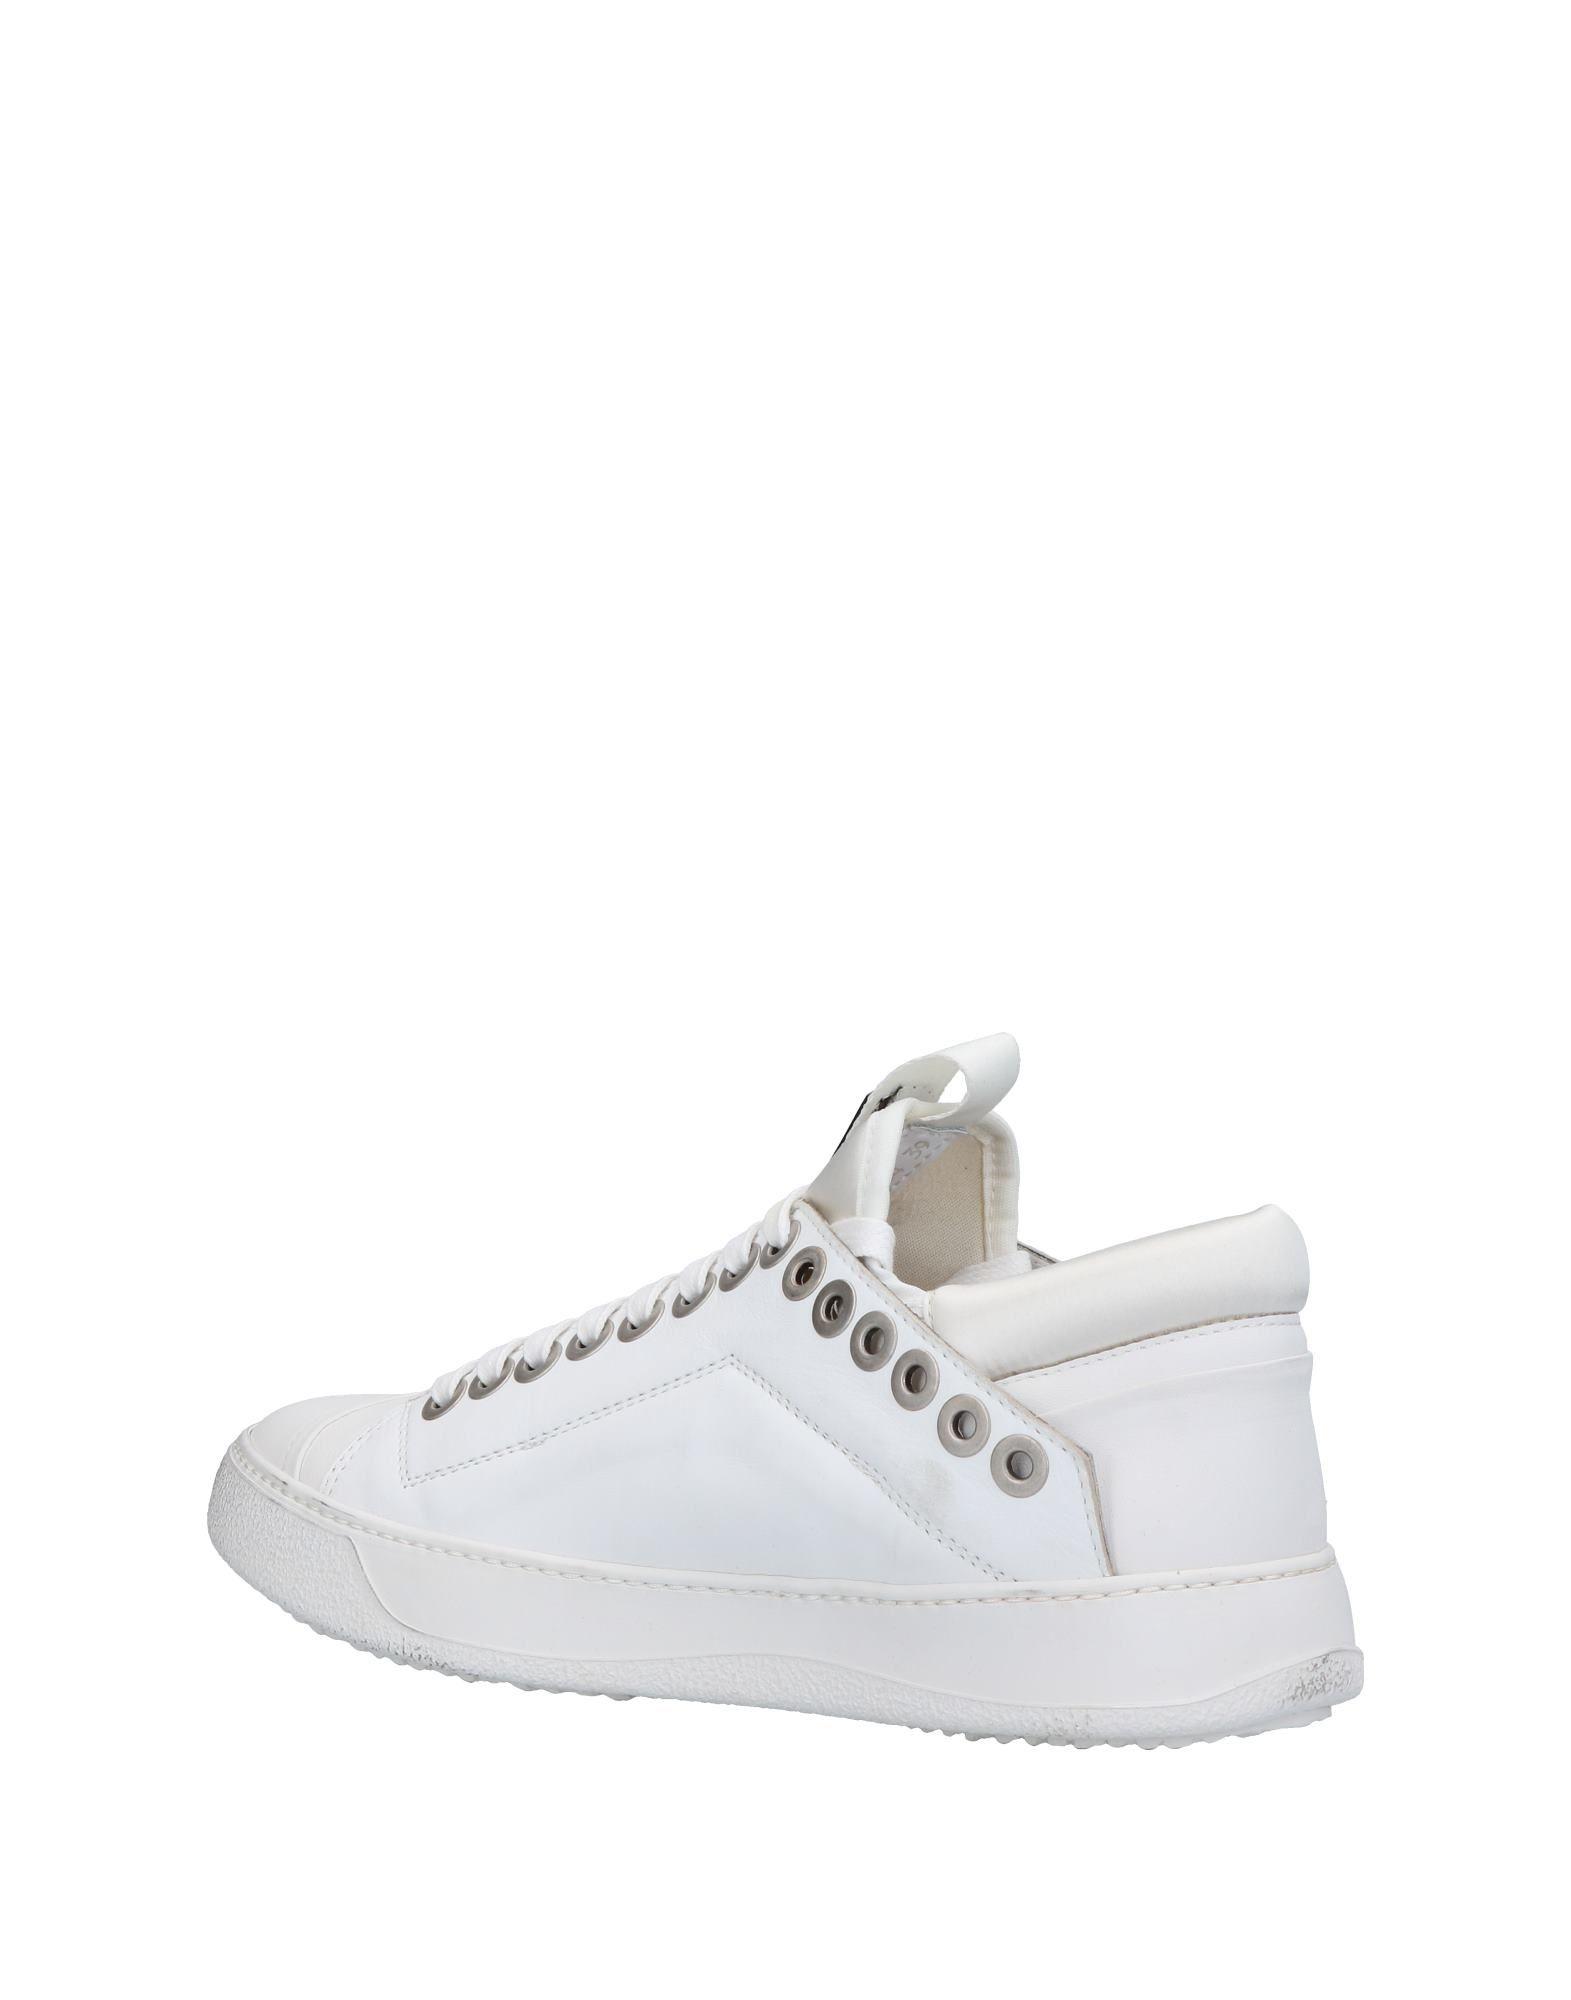 Sneakers Bruno Bordese Femme - Sneakers Bruno Bordese sur